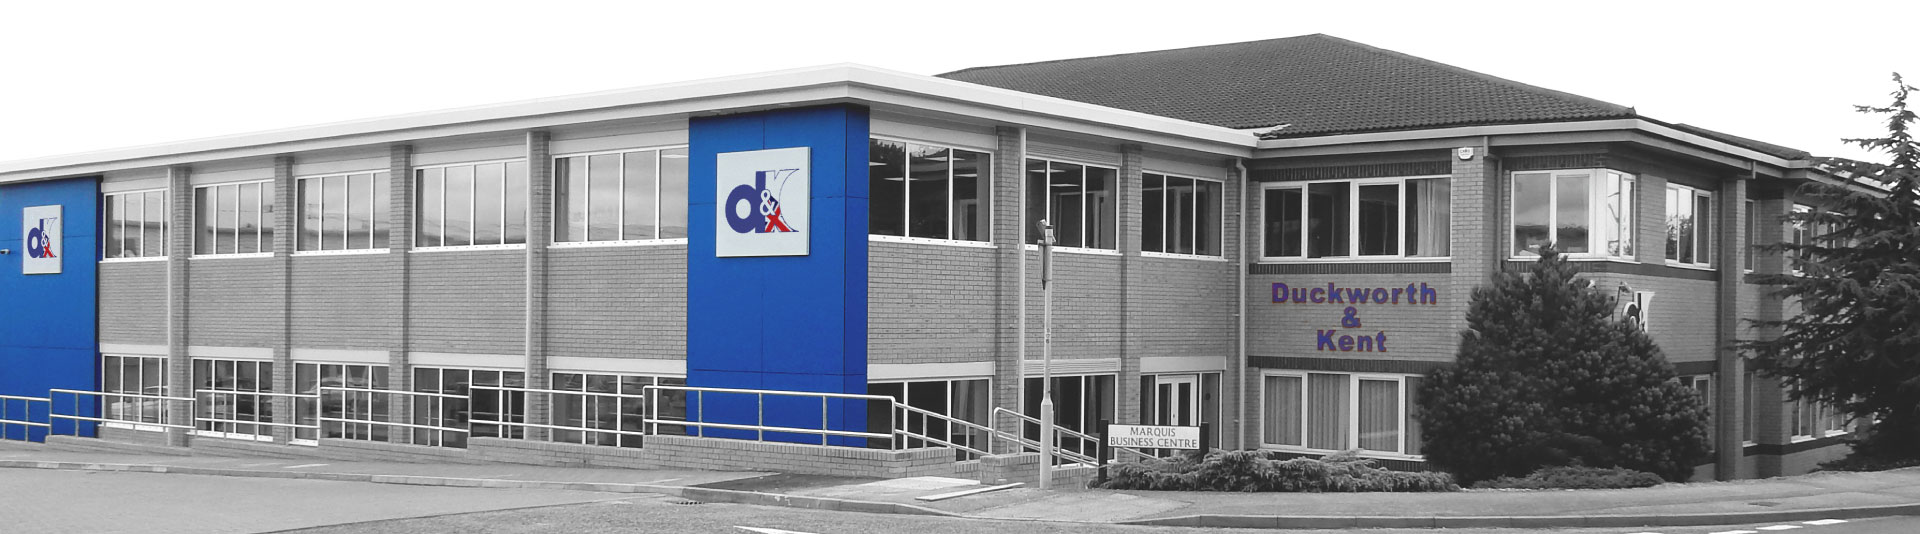 Duckworth & Kent Headquarters